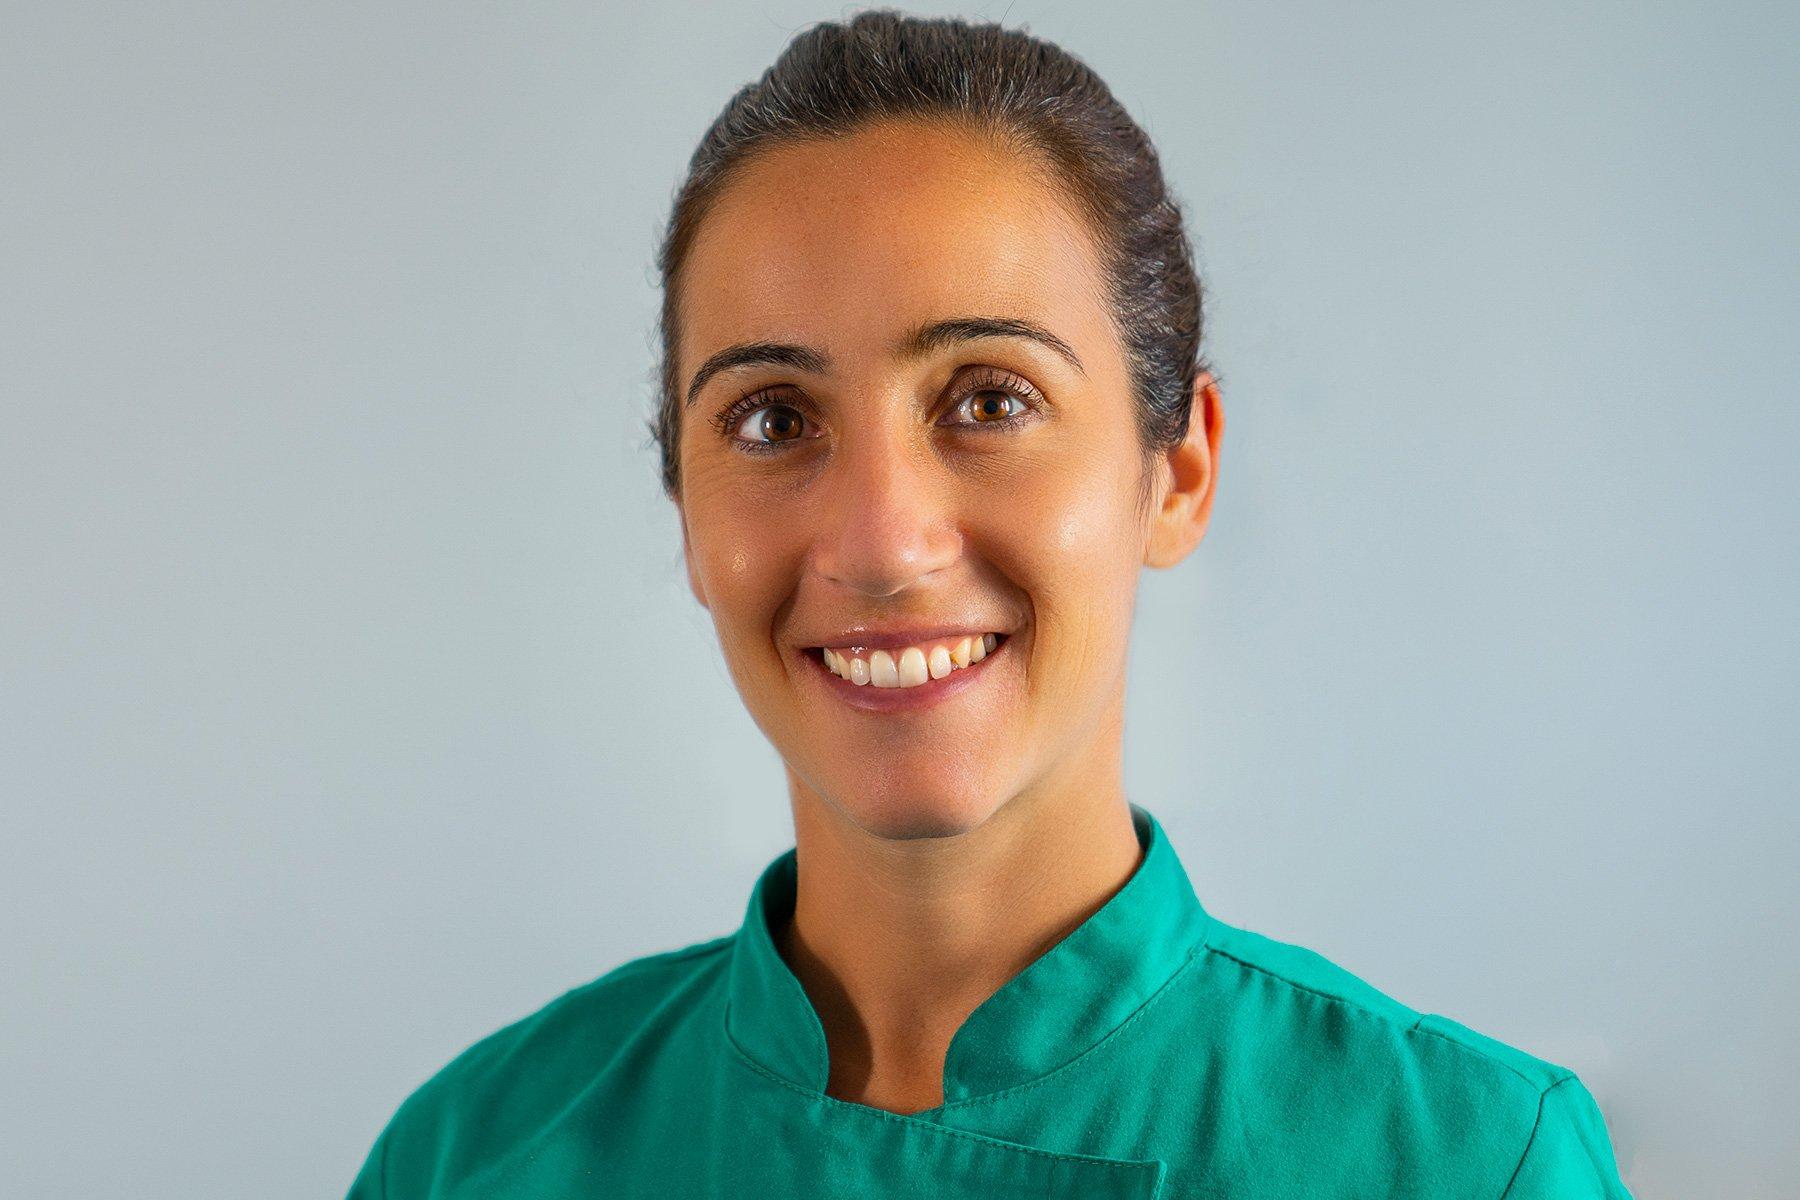 Paola Pesce